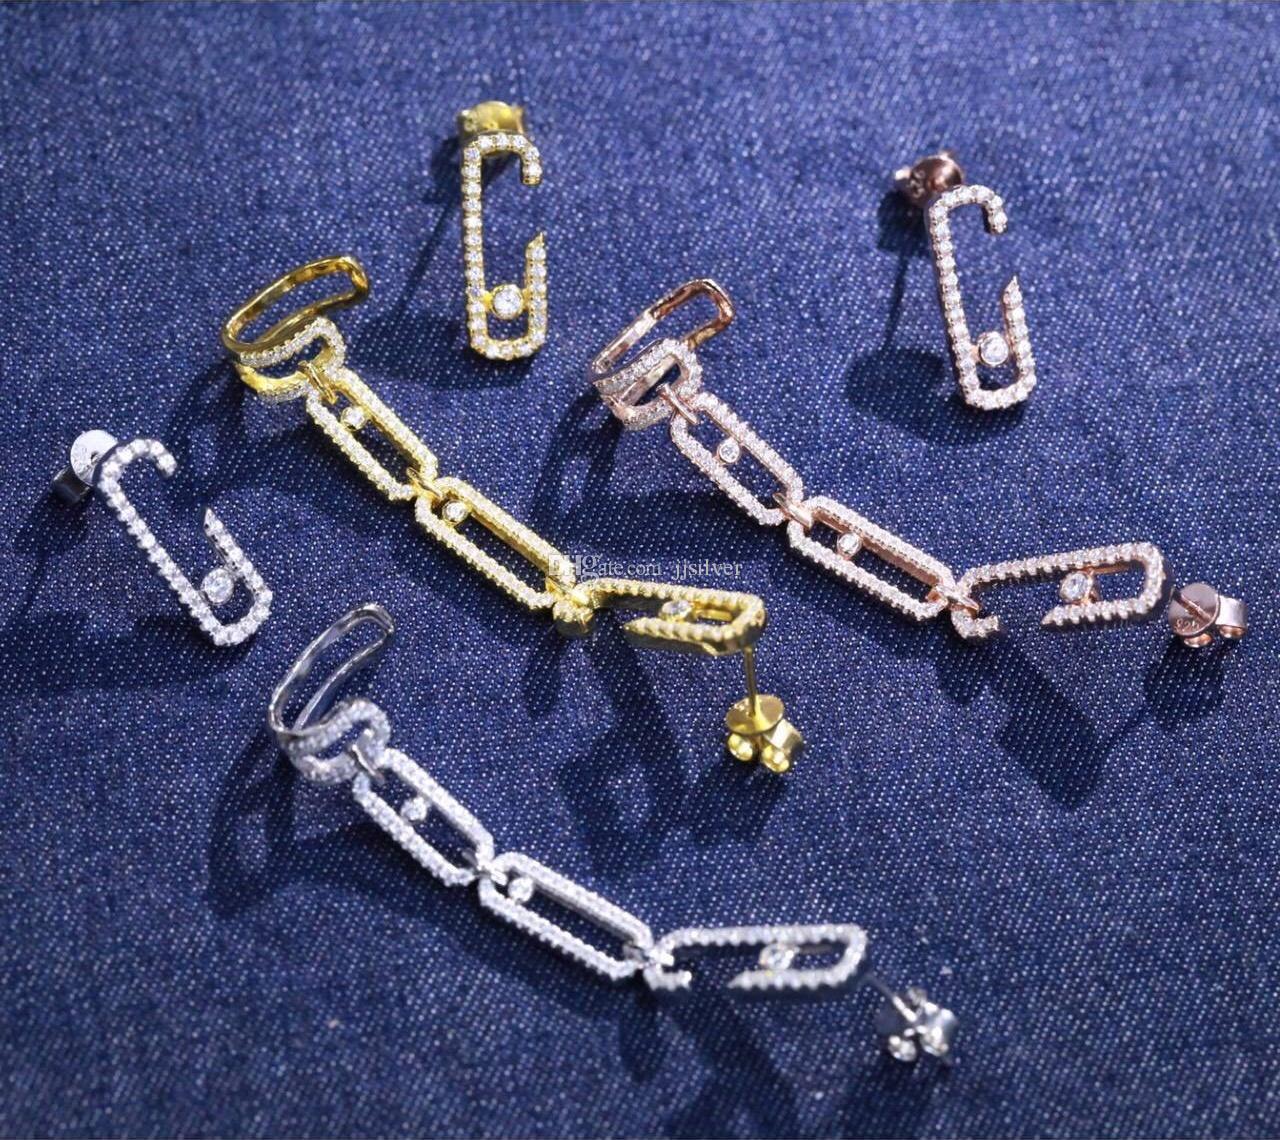 Frauen Schmuck 925 Sterling Silber boucle d'oreille femme 2017 Geometrische Beweglichen stein Ohrstulpe Ohrringe 3A Zirkonia Einhorn Pin Asymmetrische